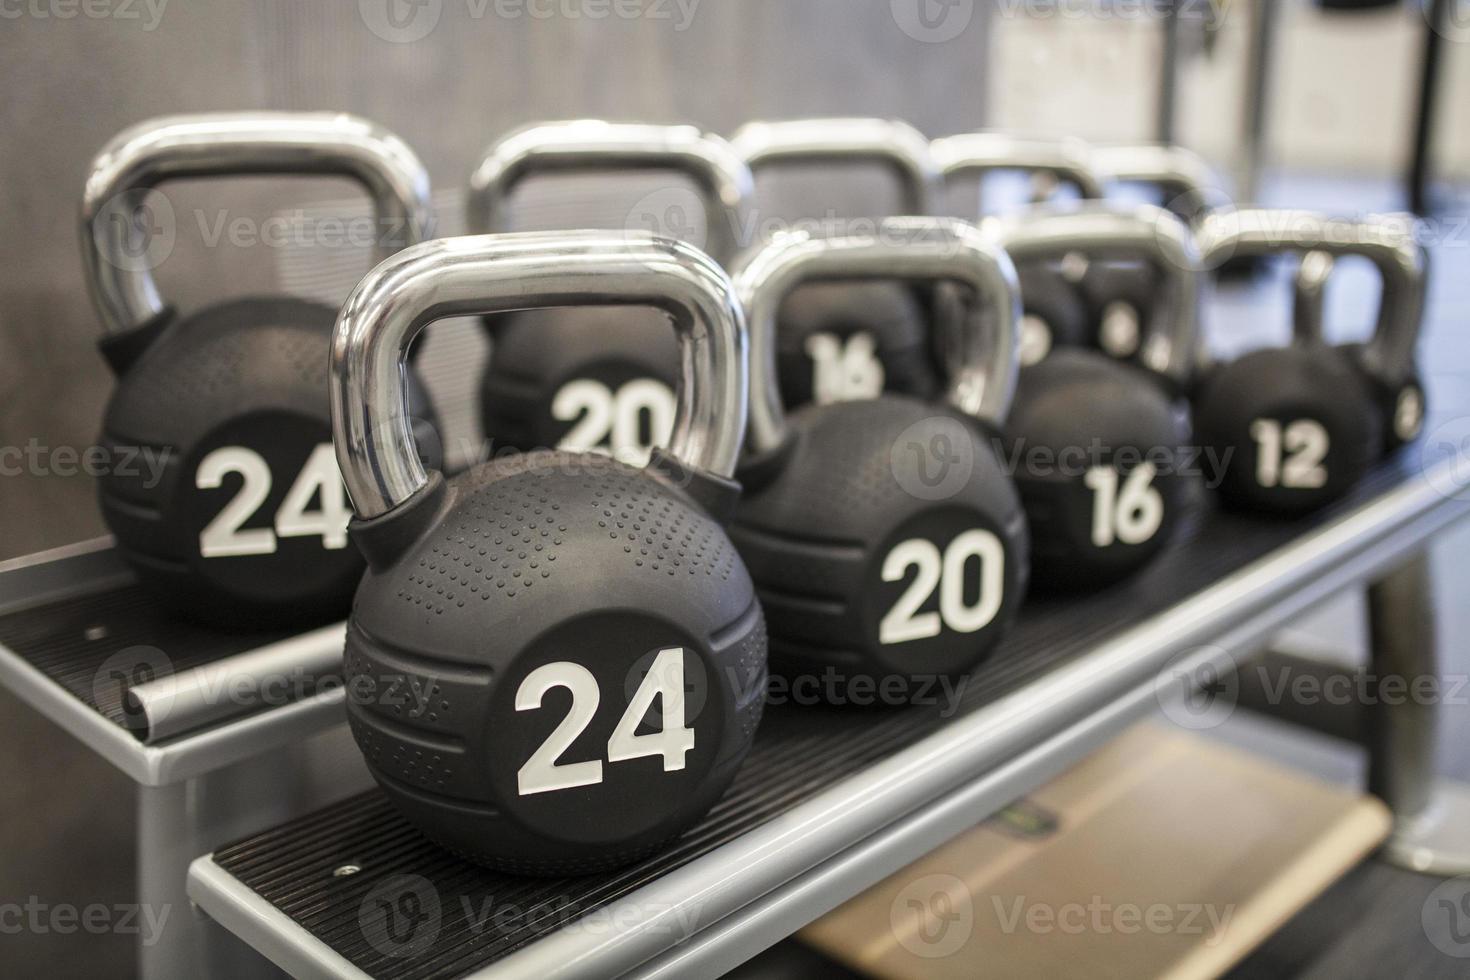 poids lourds kettlebells dans une salle de sport photo